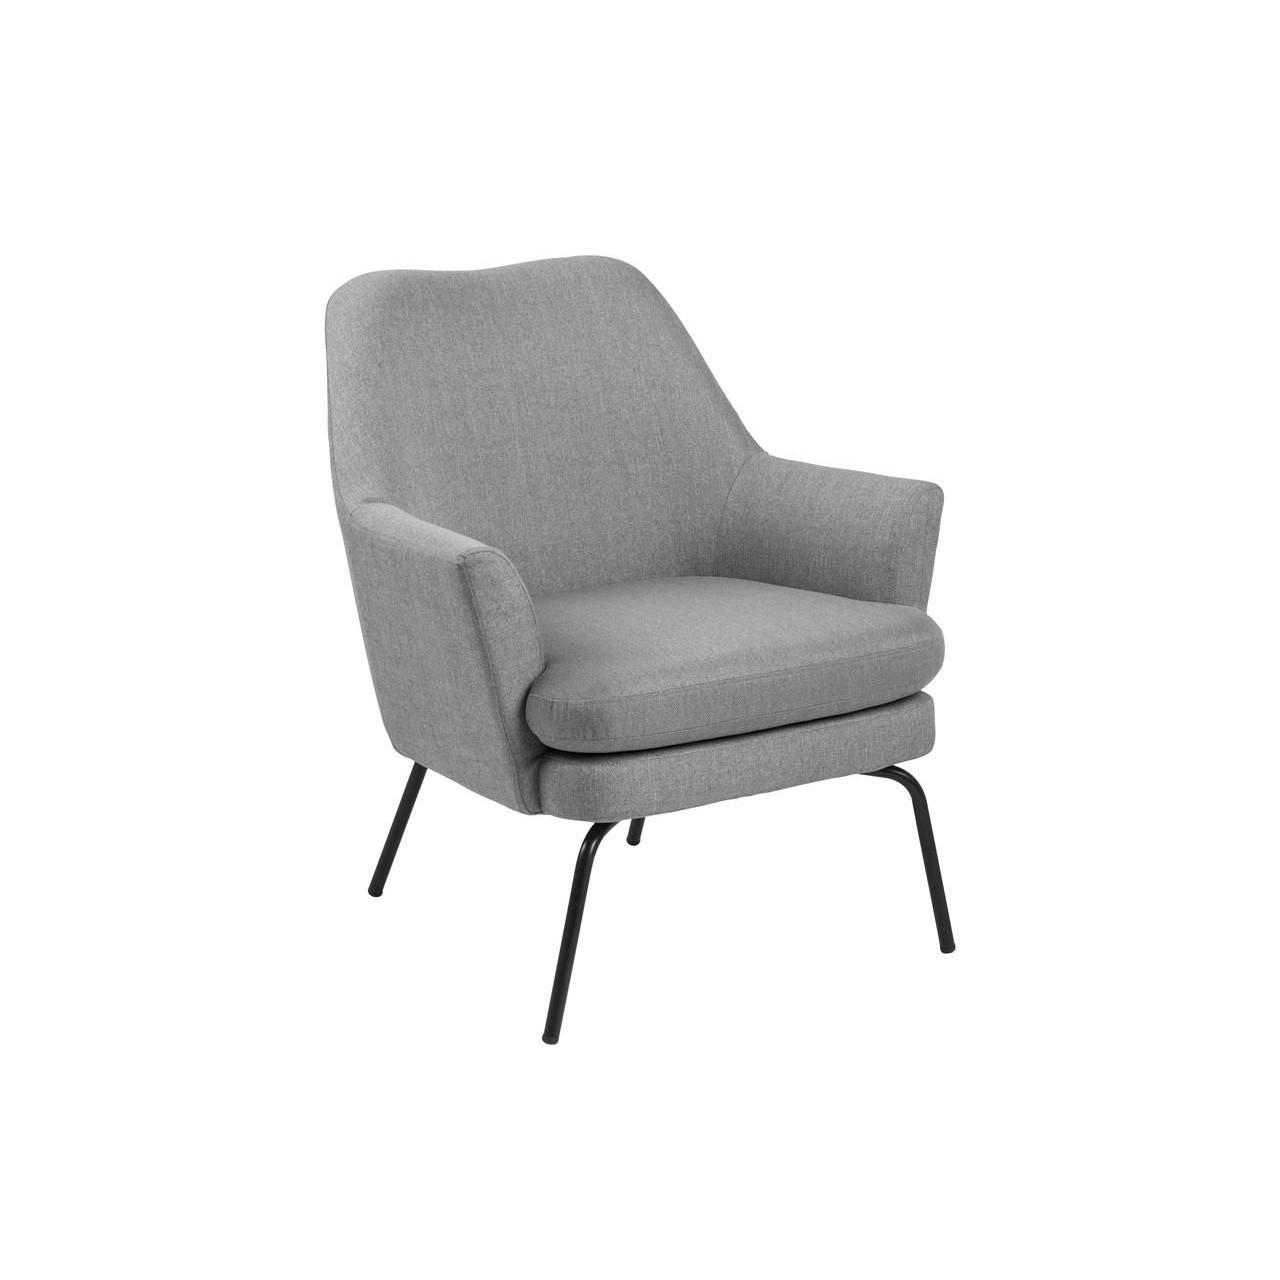 Resting Chair Gwen | Light Grey